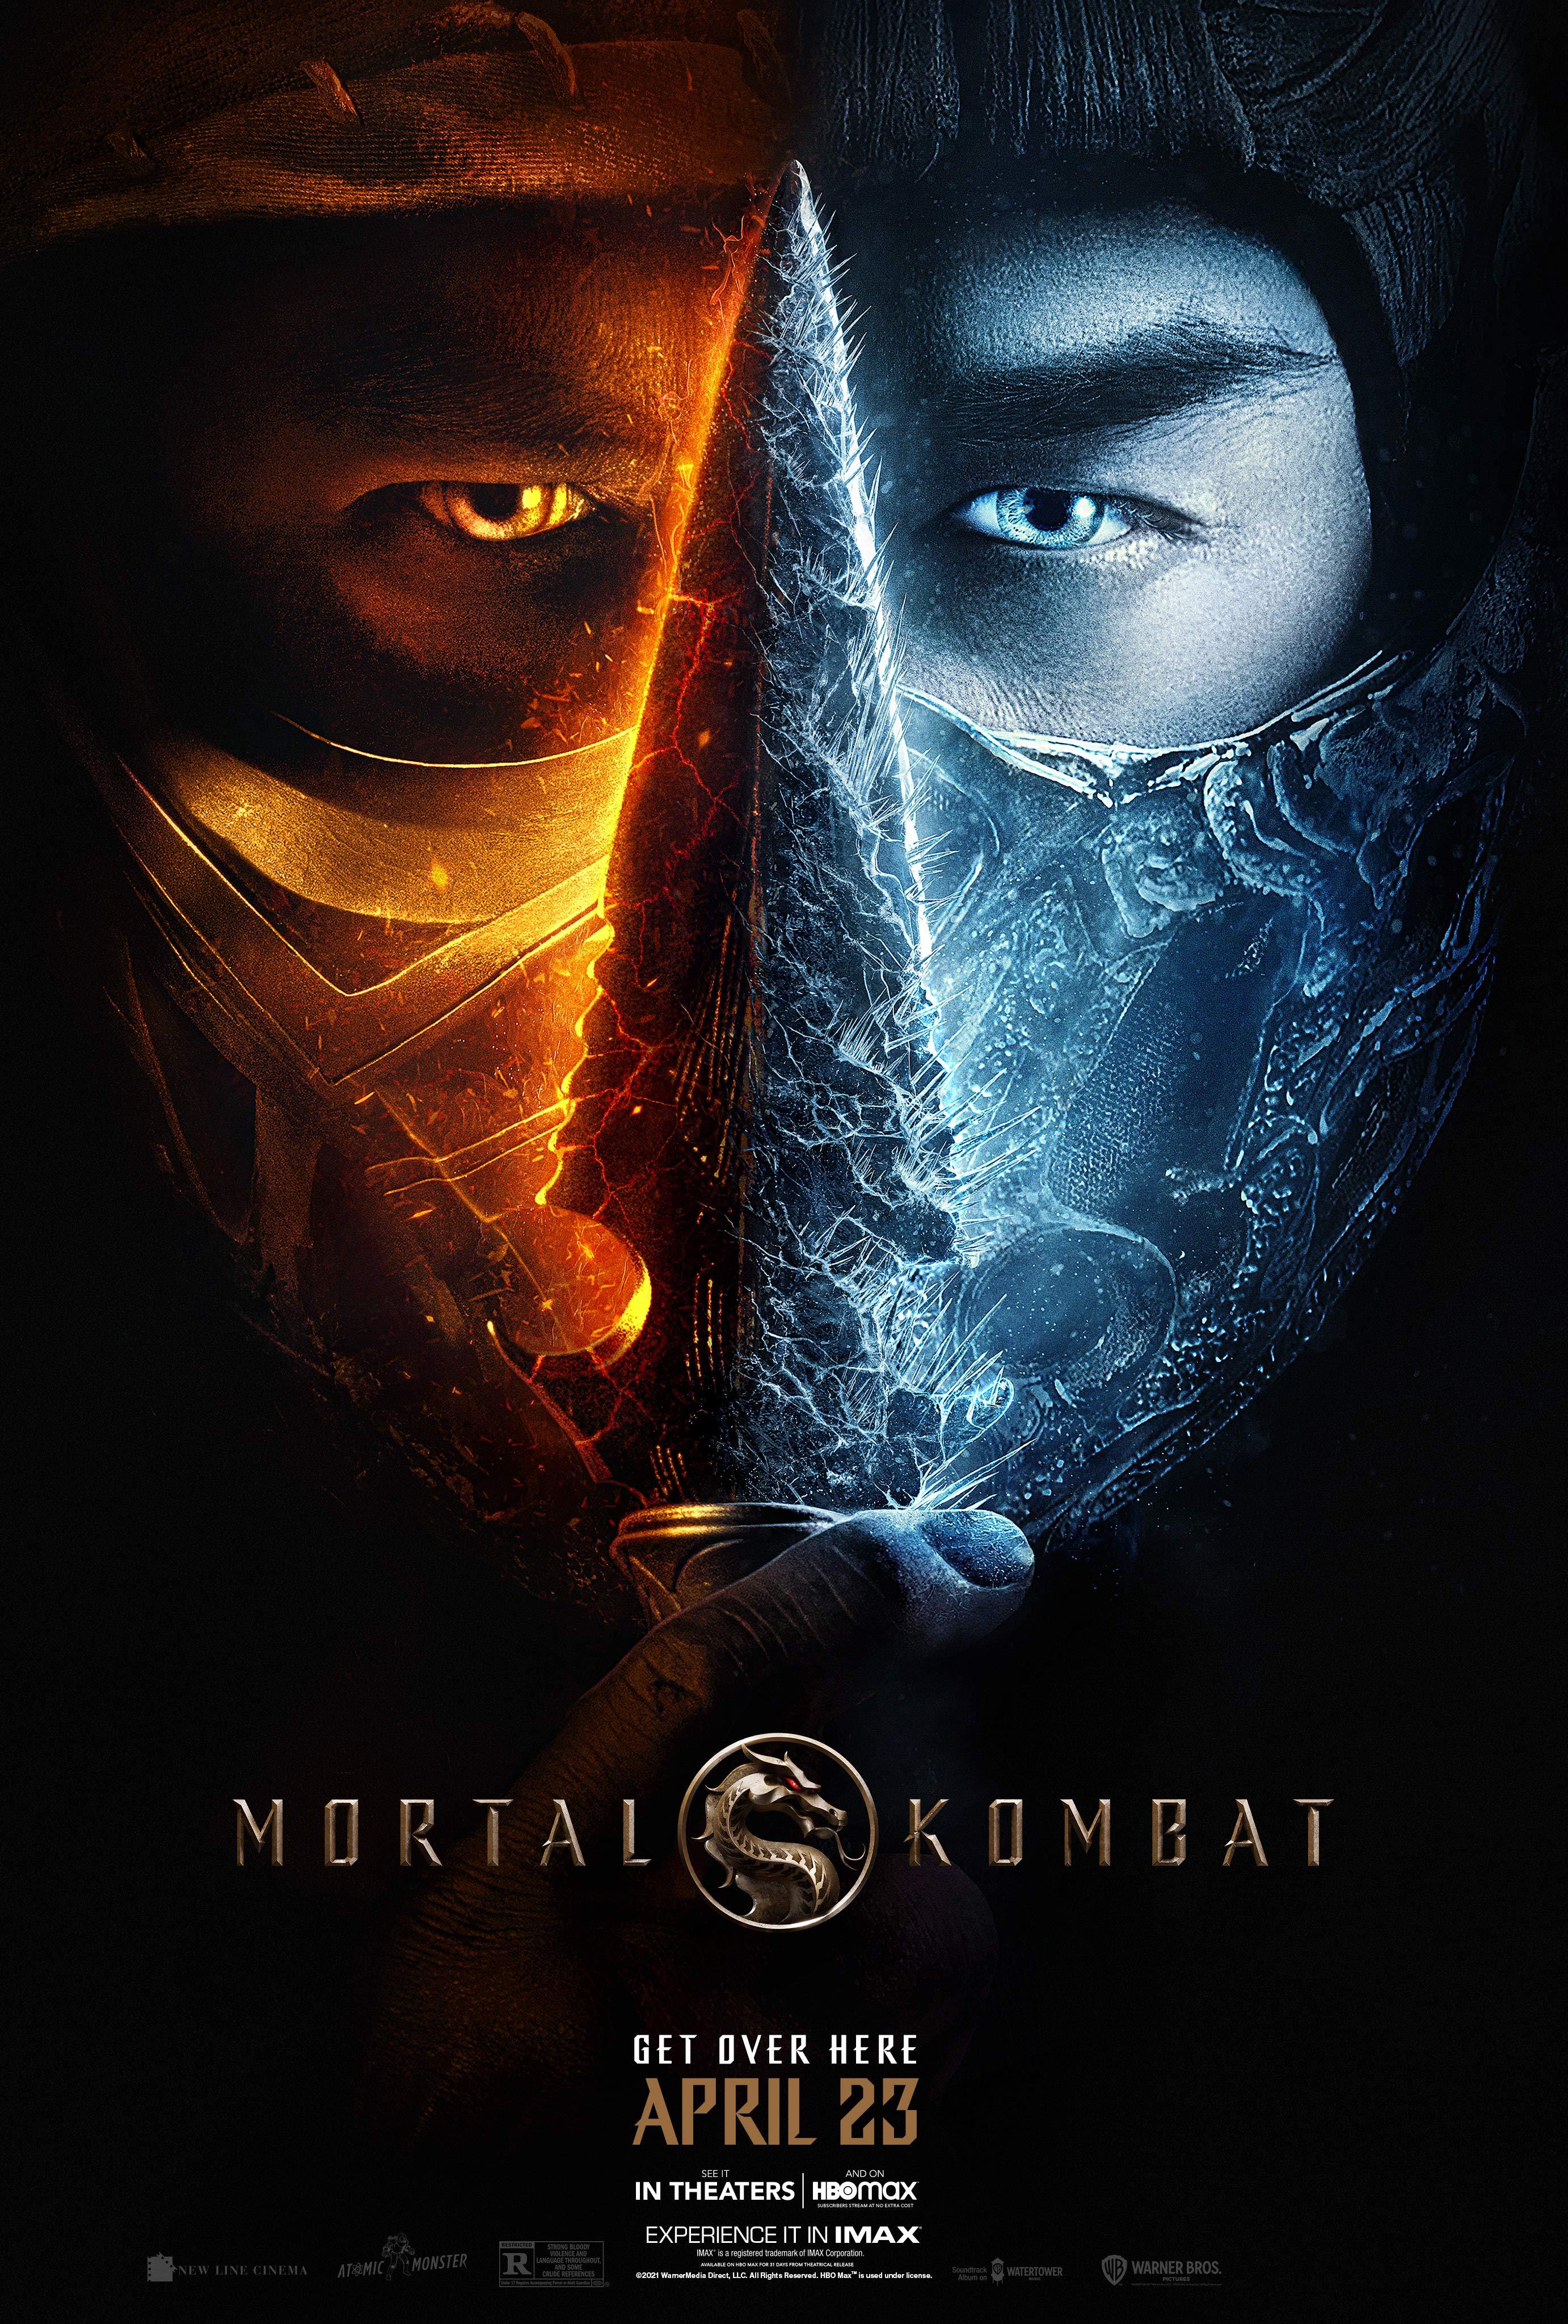 Mortal Kombat 20 Film Review – Jay Hates Movies